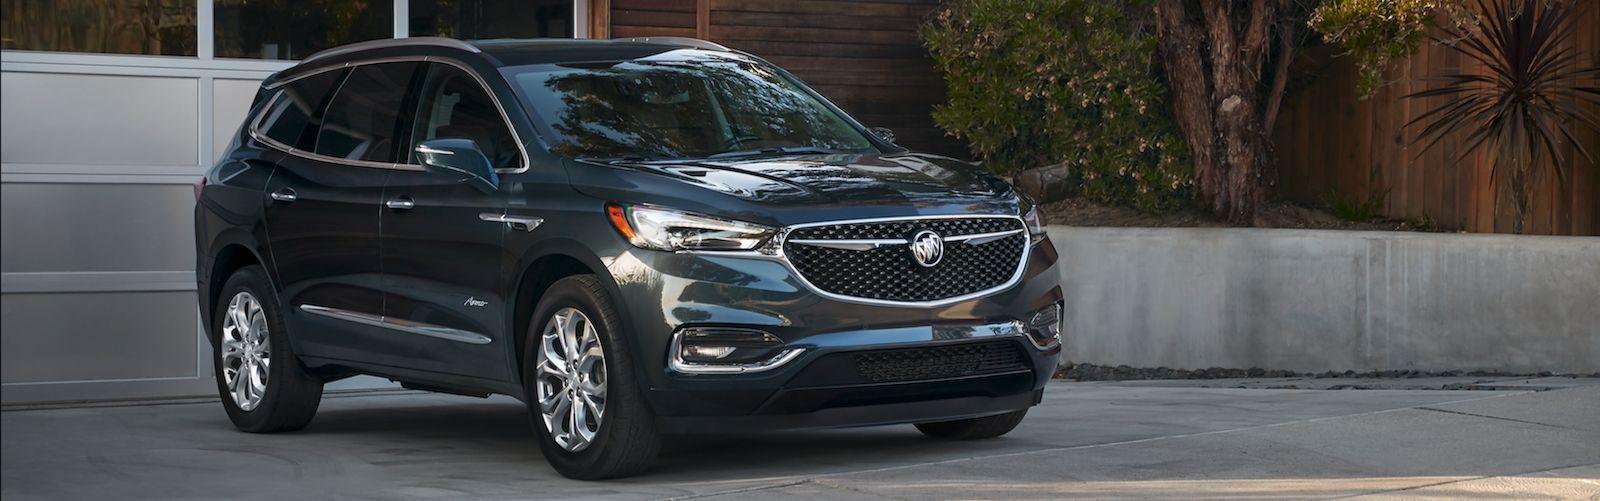 2019 Buick Enclave Trim Levels Price